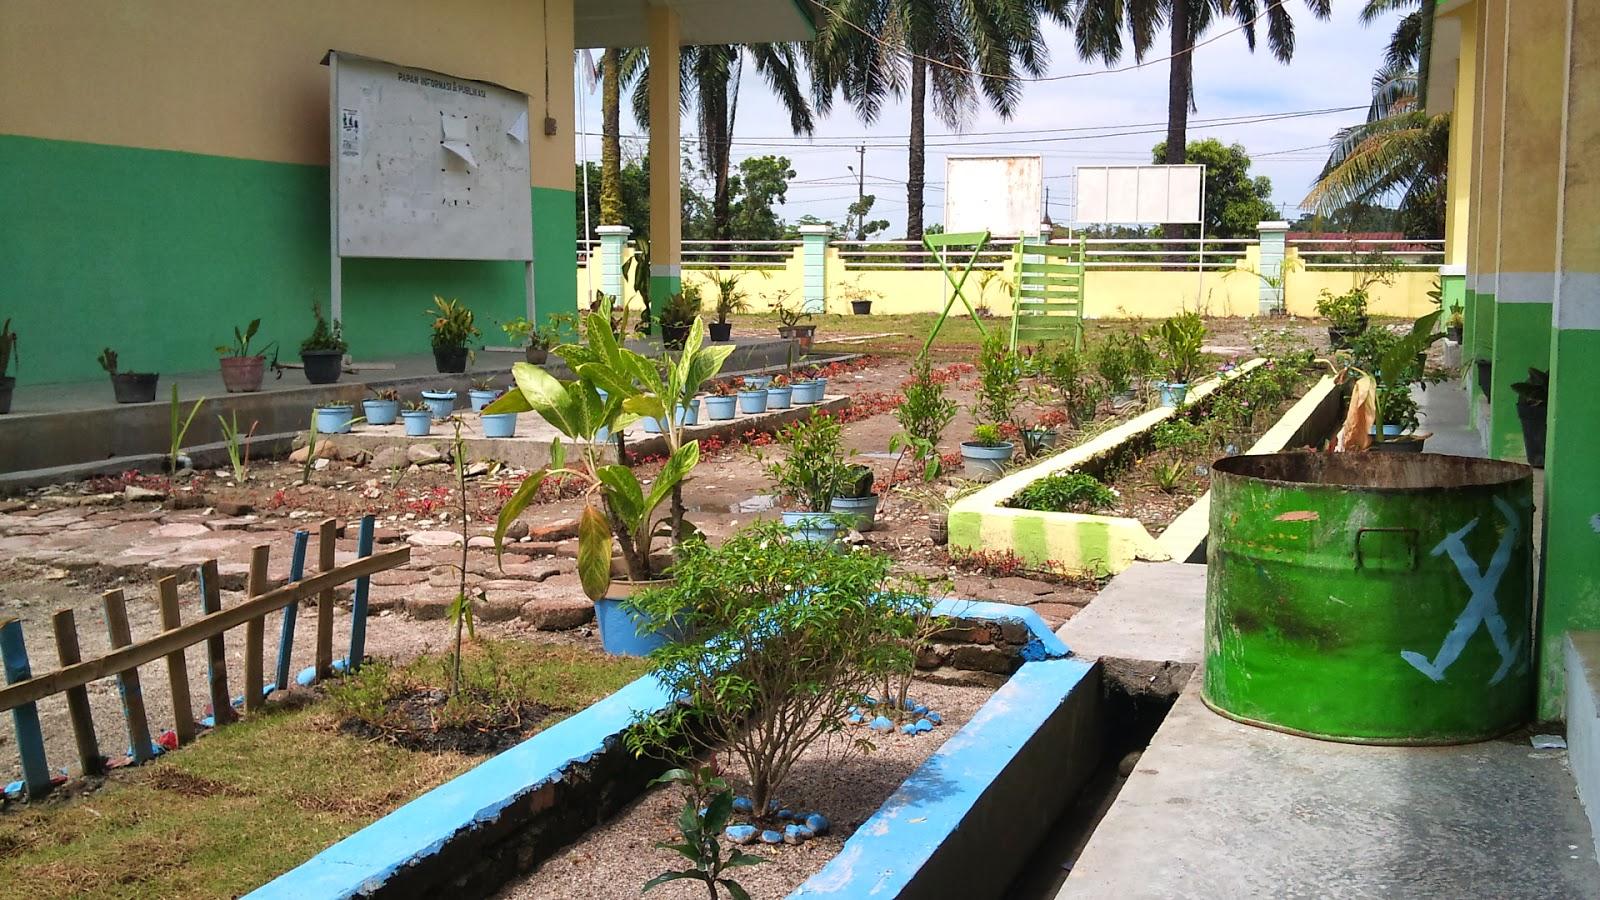 Class design and garden TKJ 12 ~ Koko Arbi